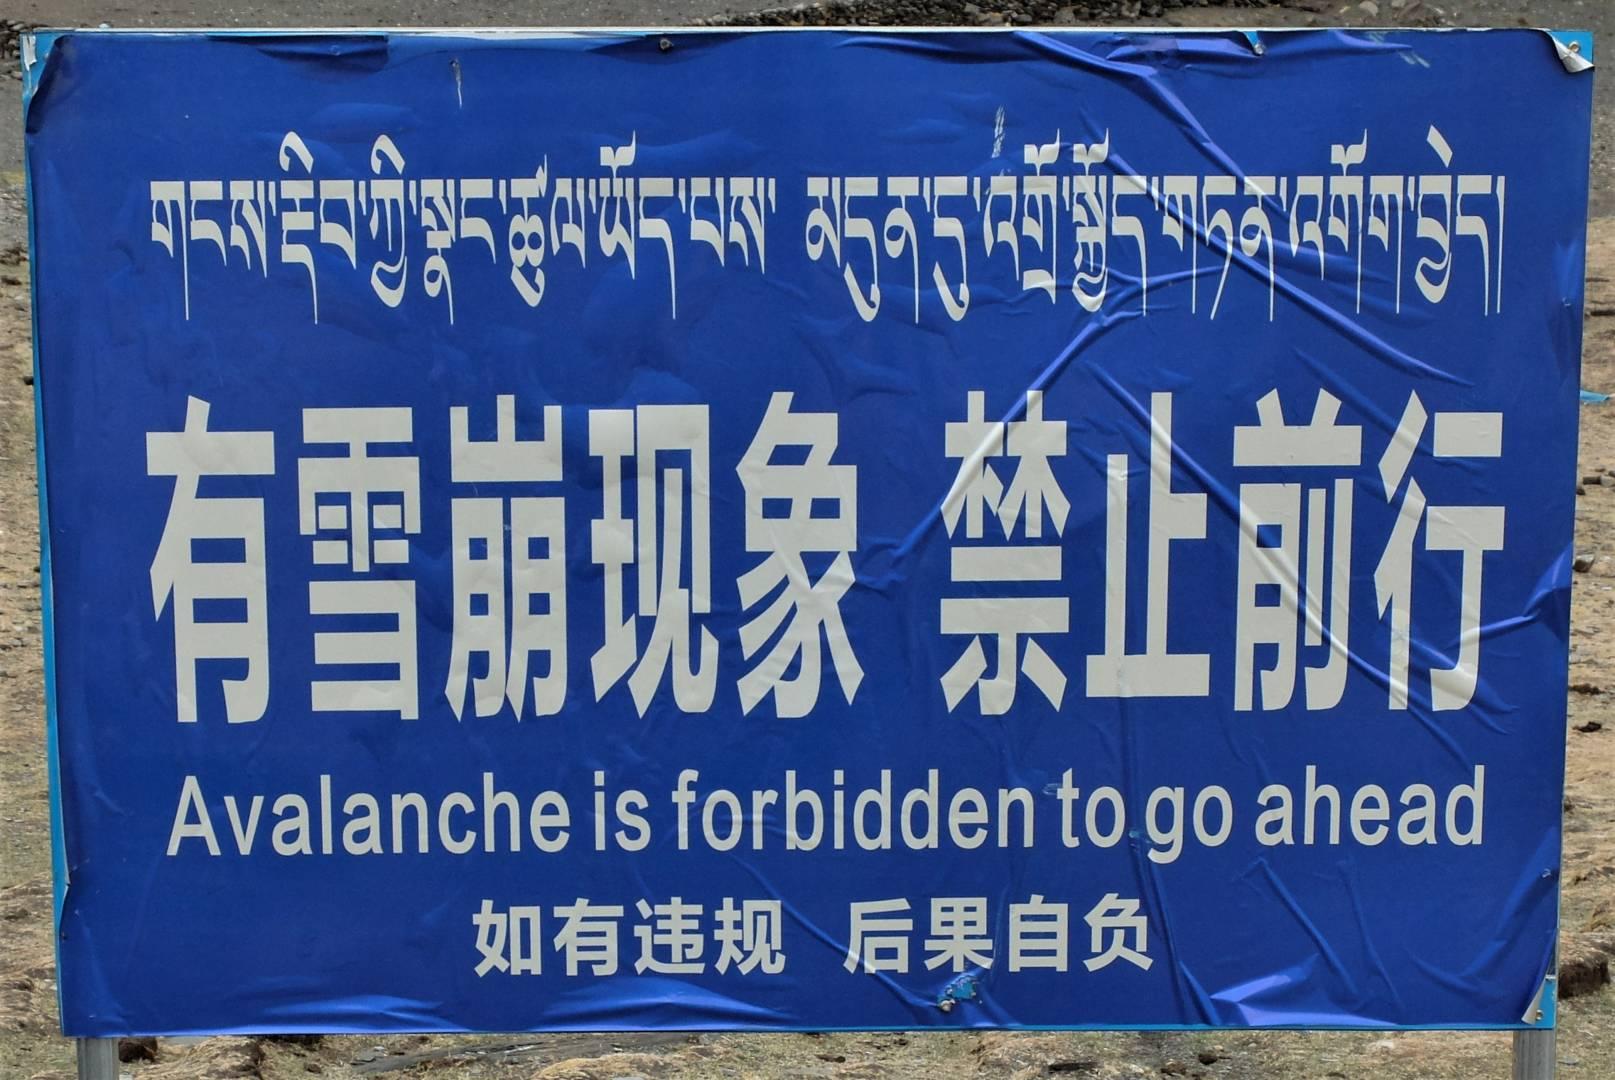 Heed the warning sign